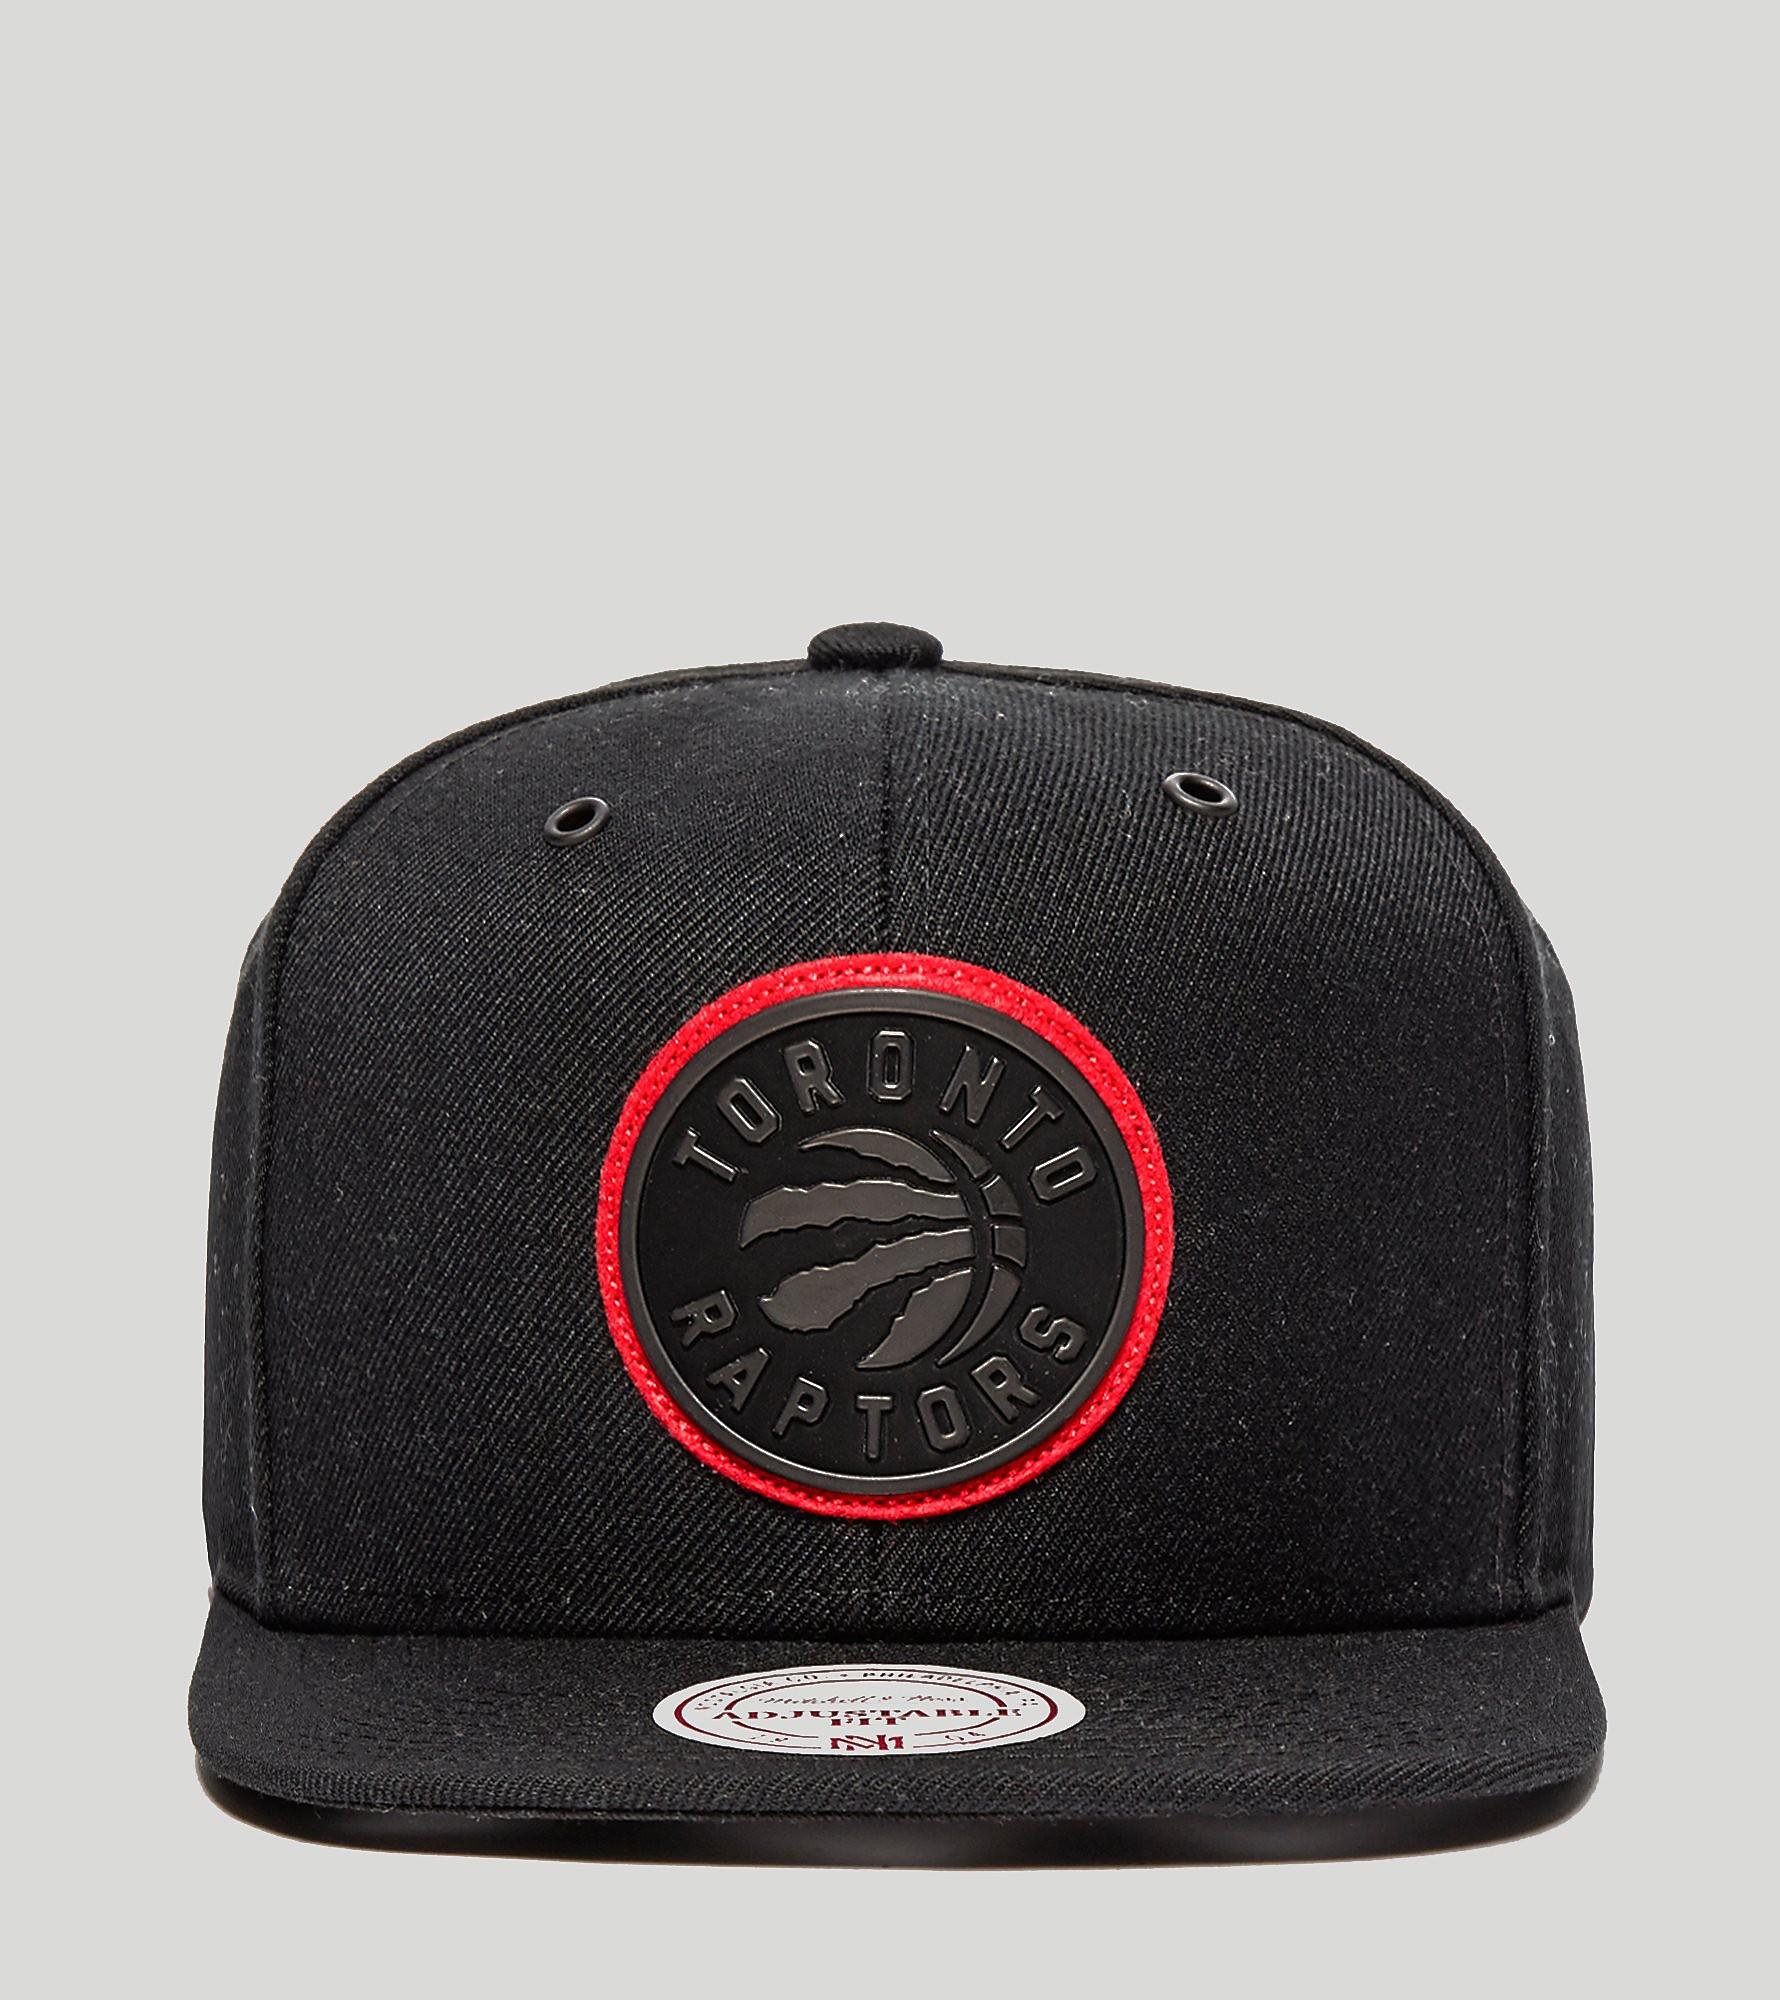 Mitchell & Ness Filter Raptors Snapback Cap